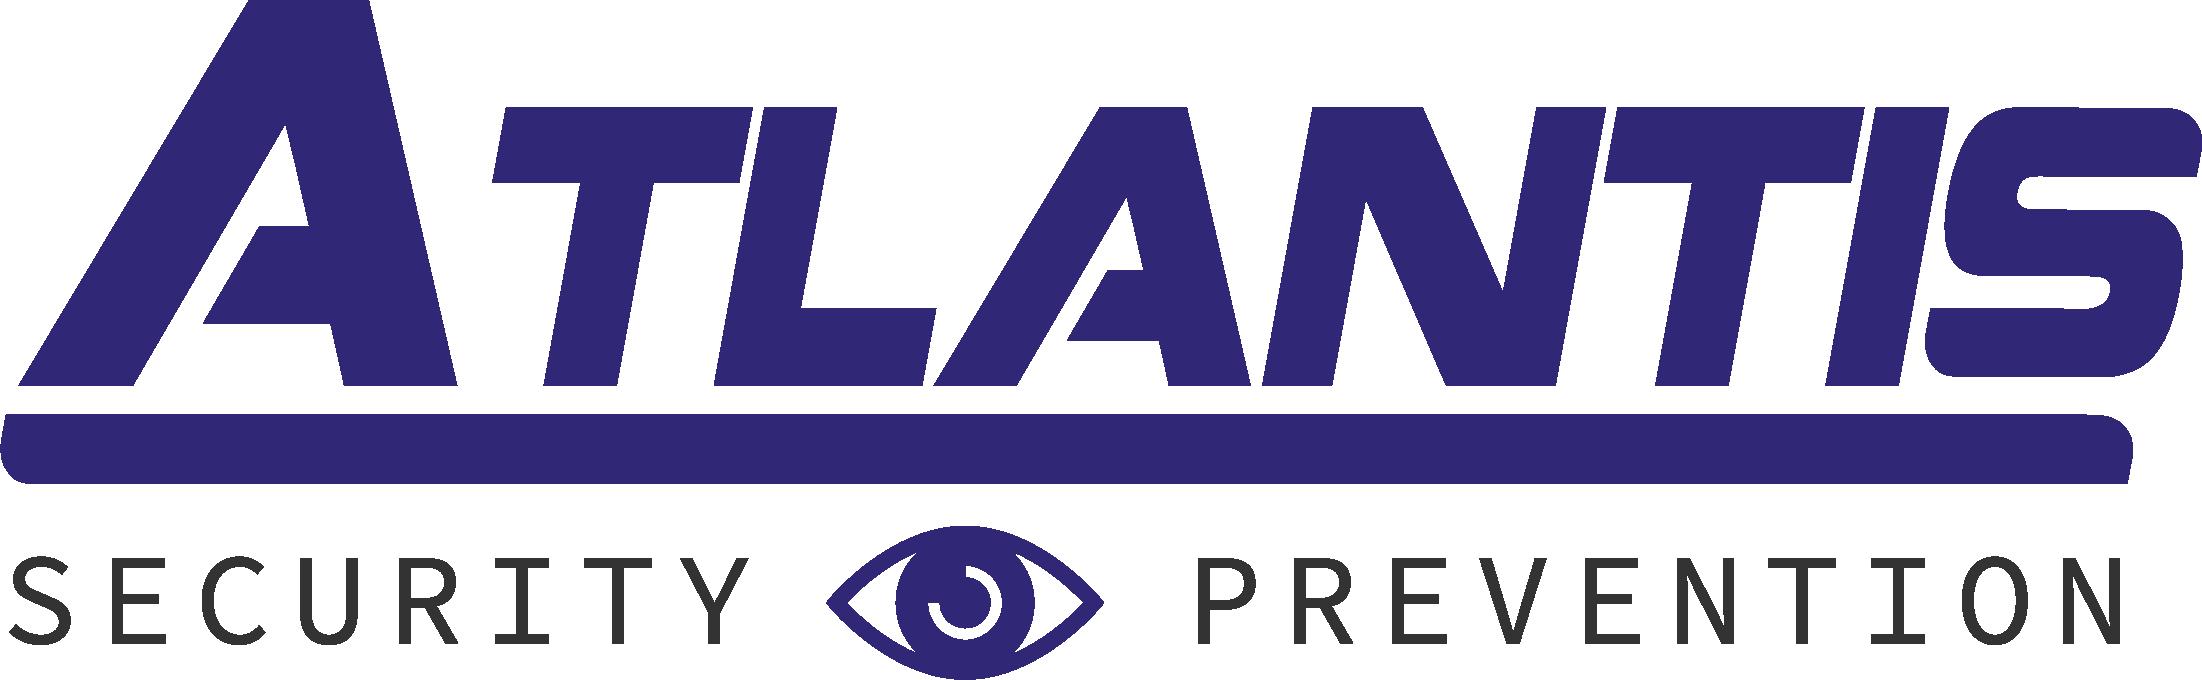 atlantis security